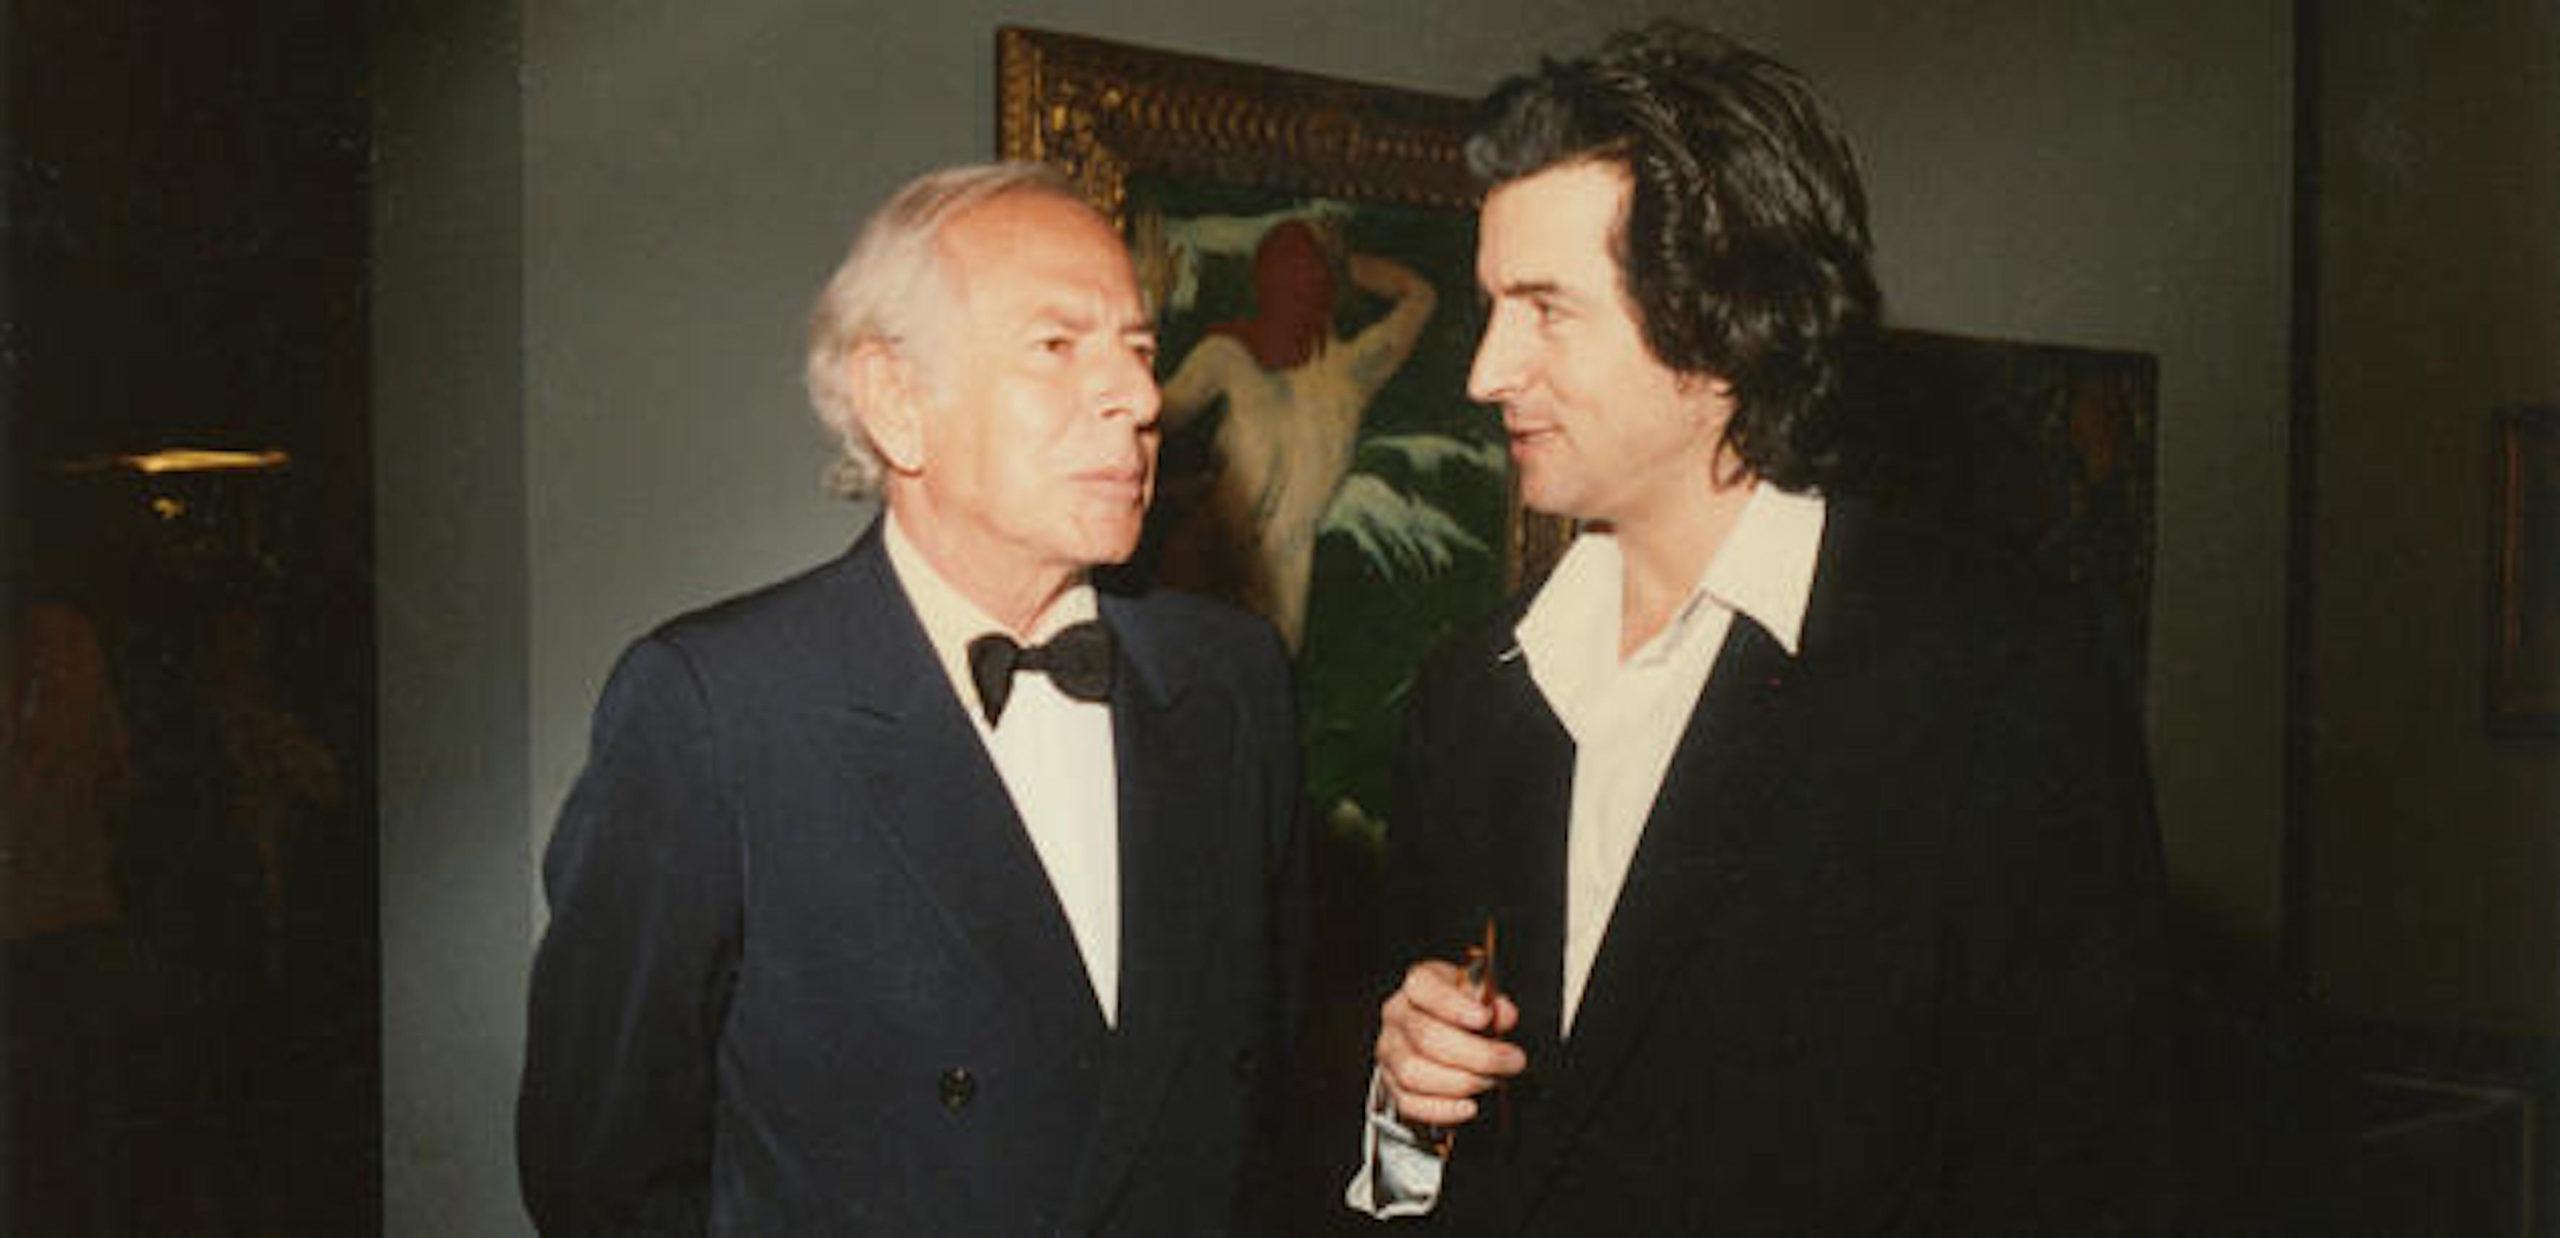 Jean Daniel en compagnie de Bernard-Henri Lévy.